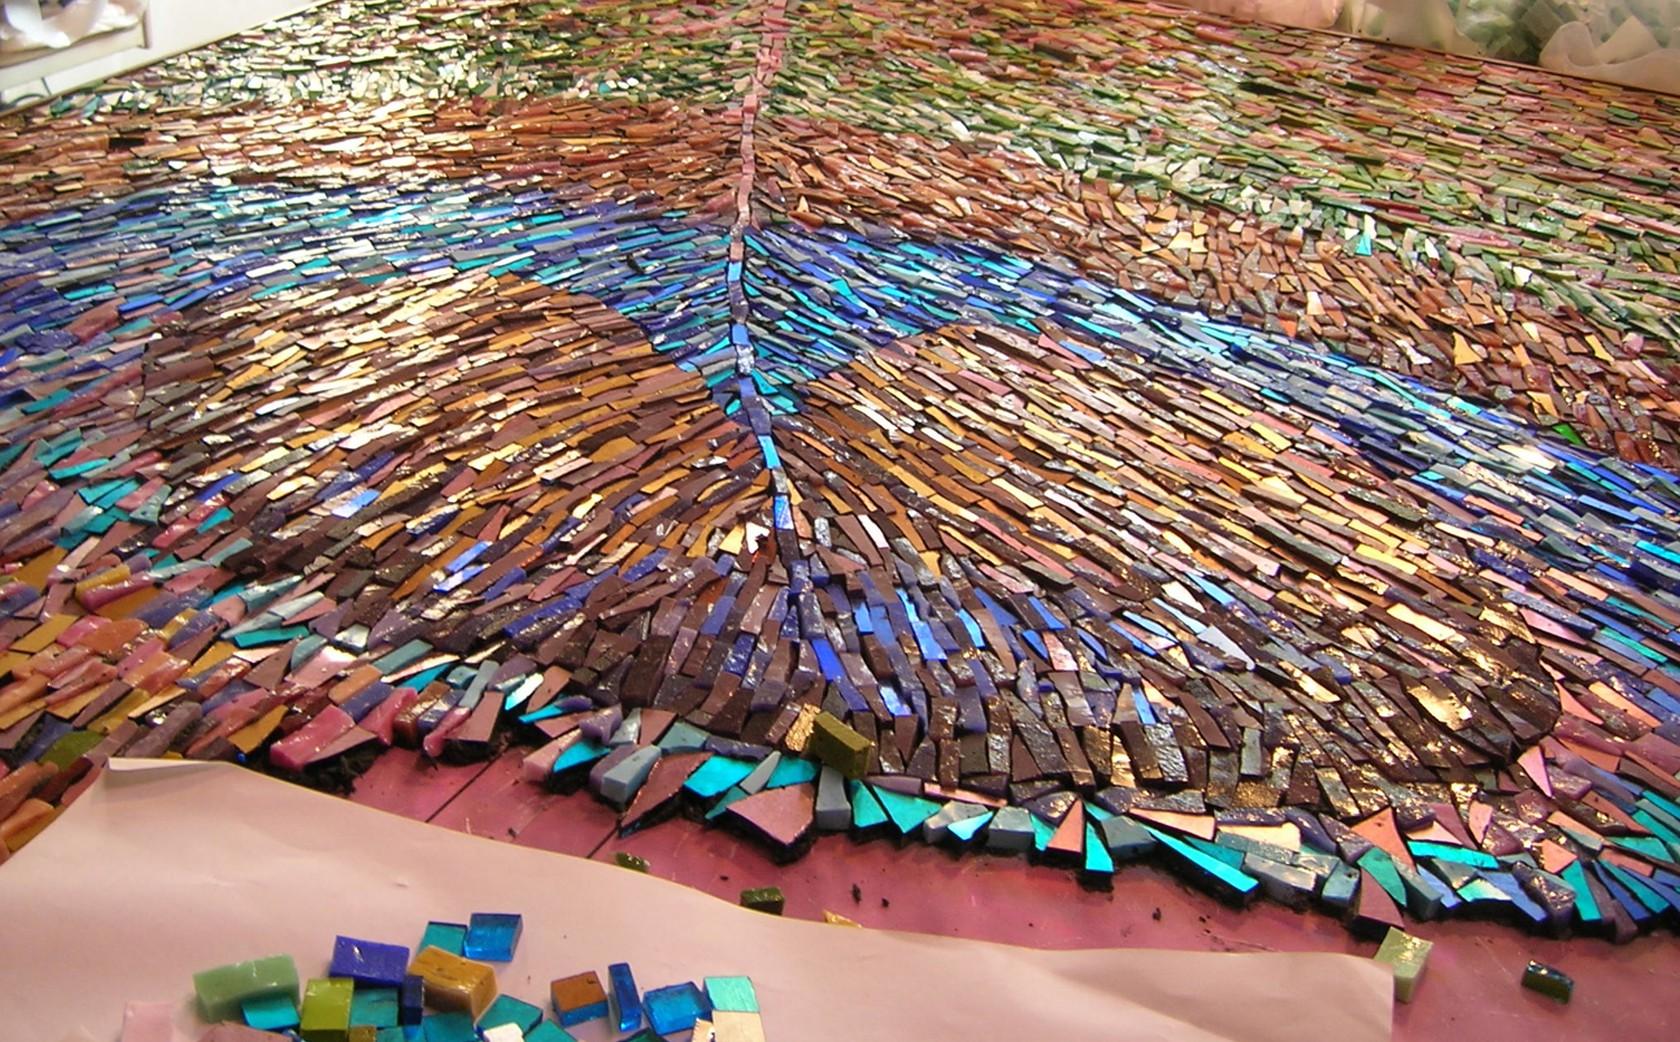 Peacock Mosaic - work in progress